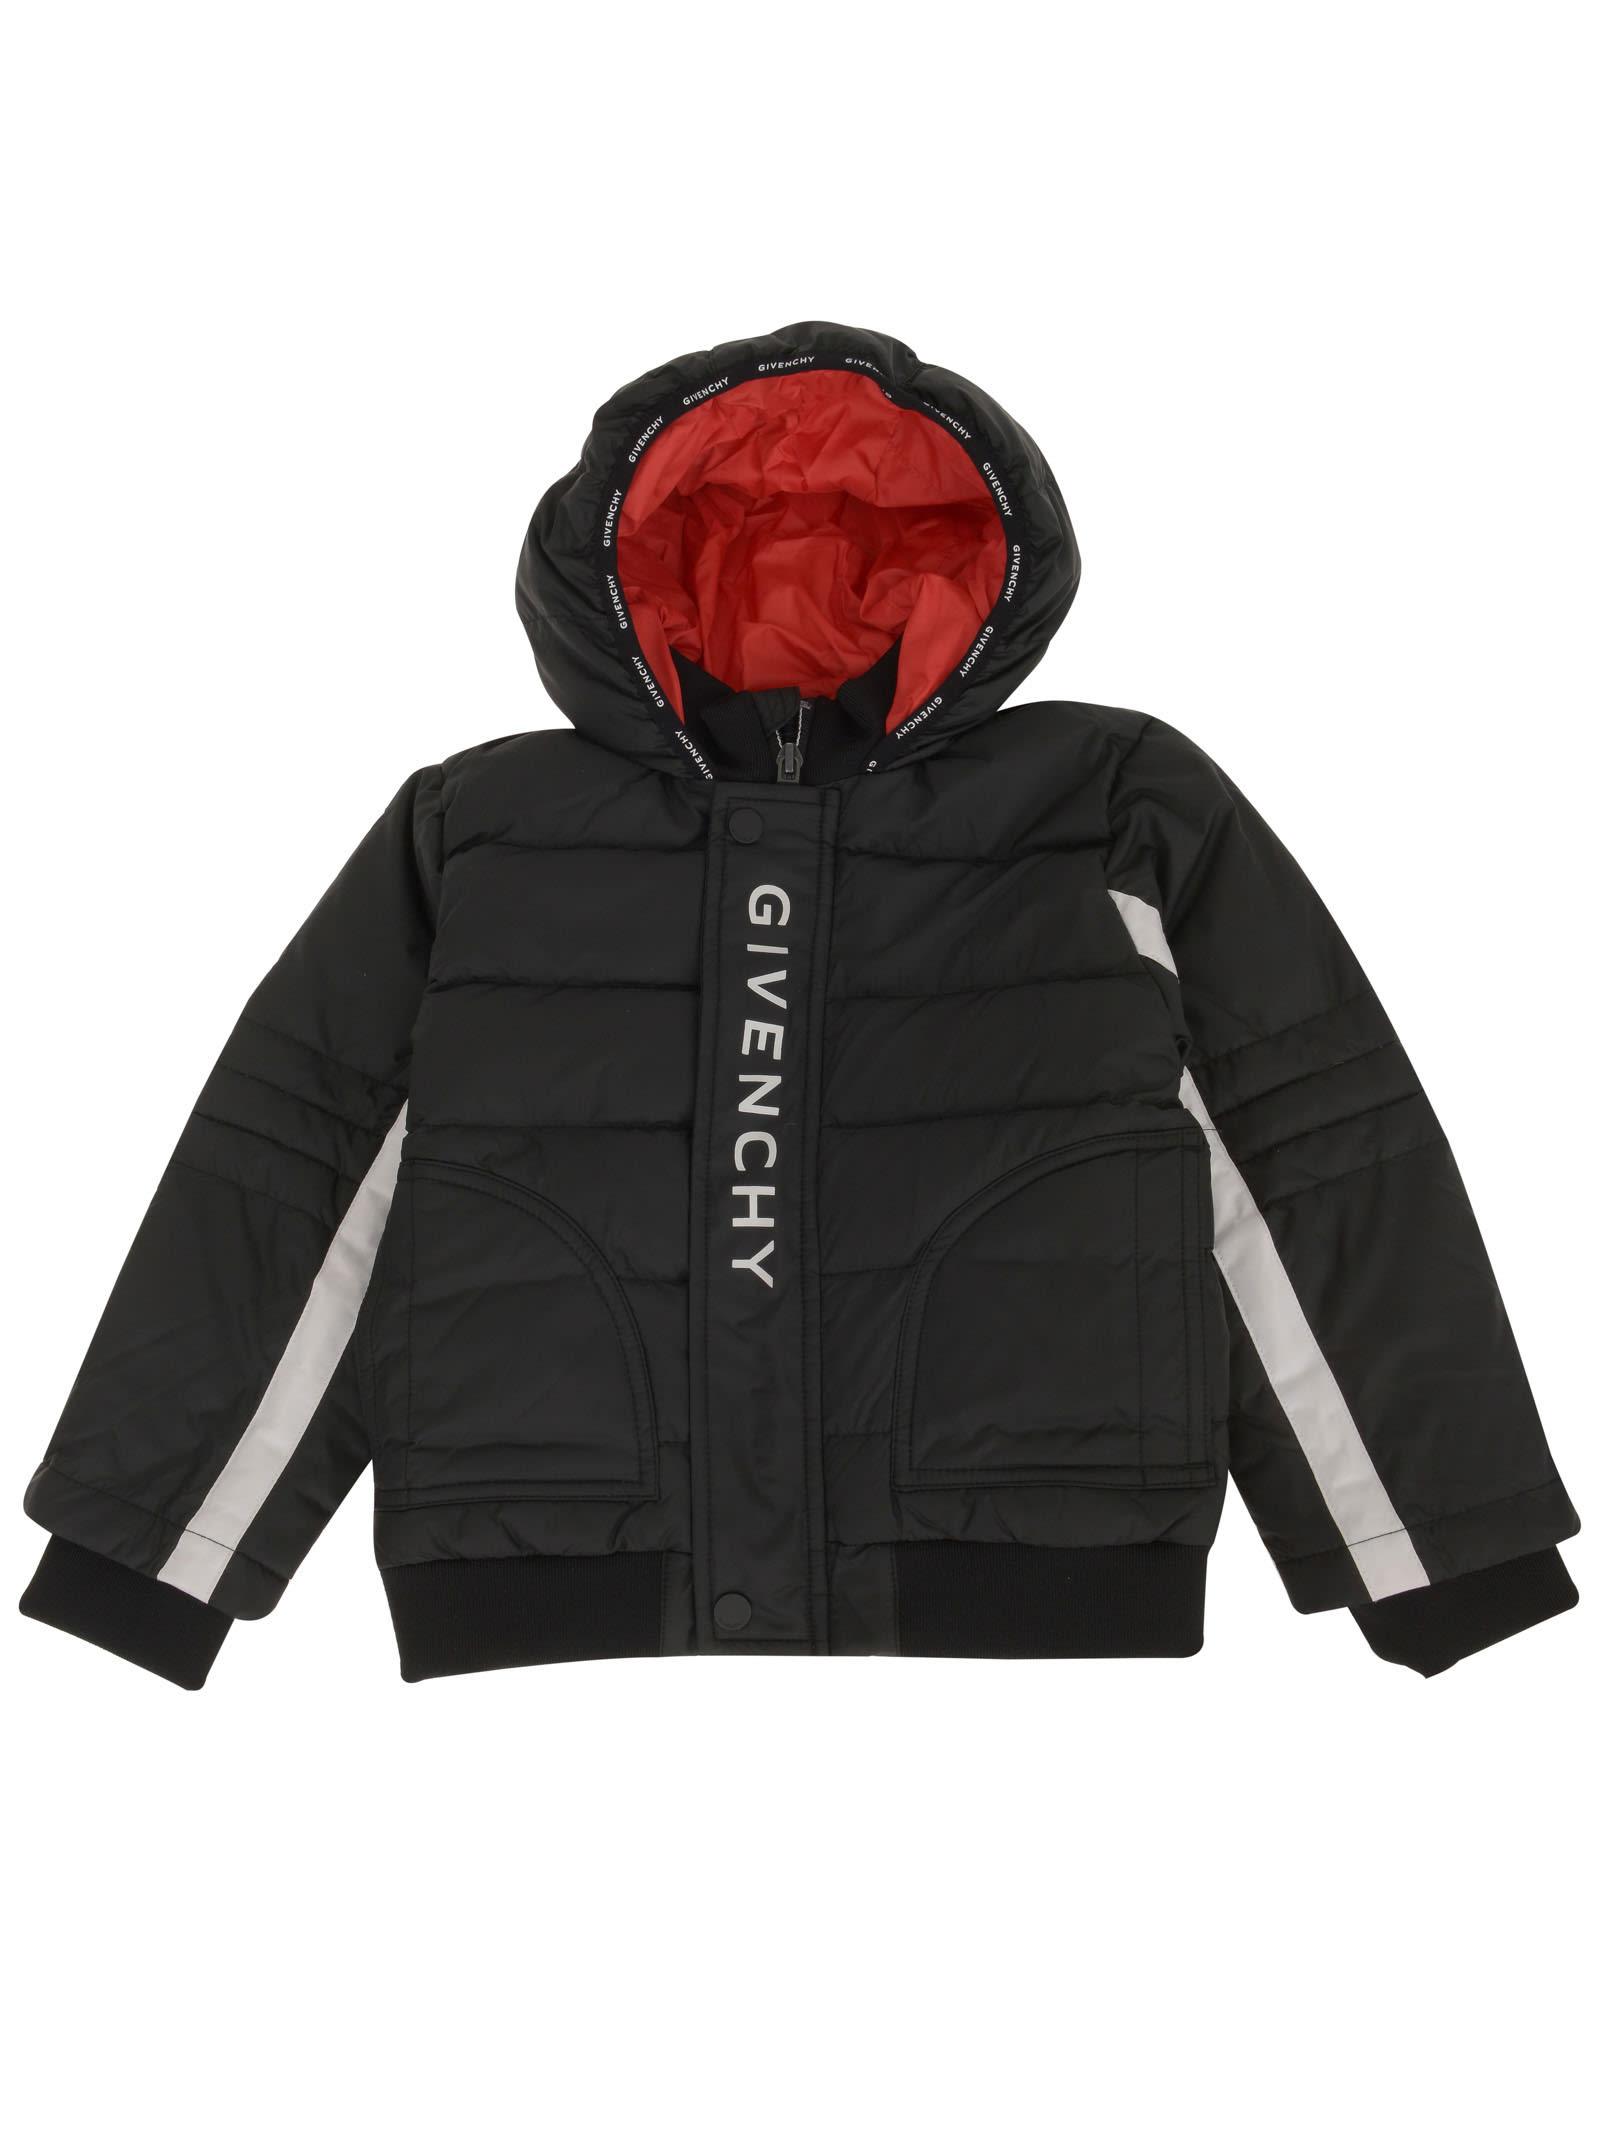 Givenchy Babies' Jacket  Kids In Black